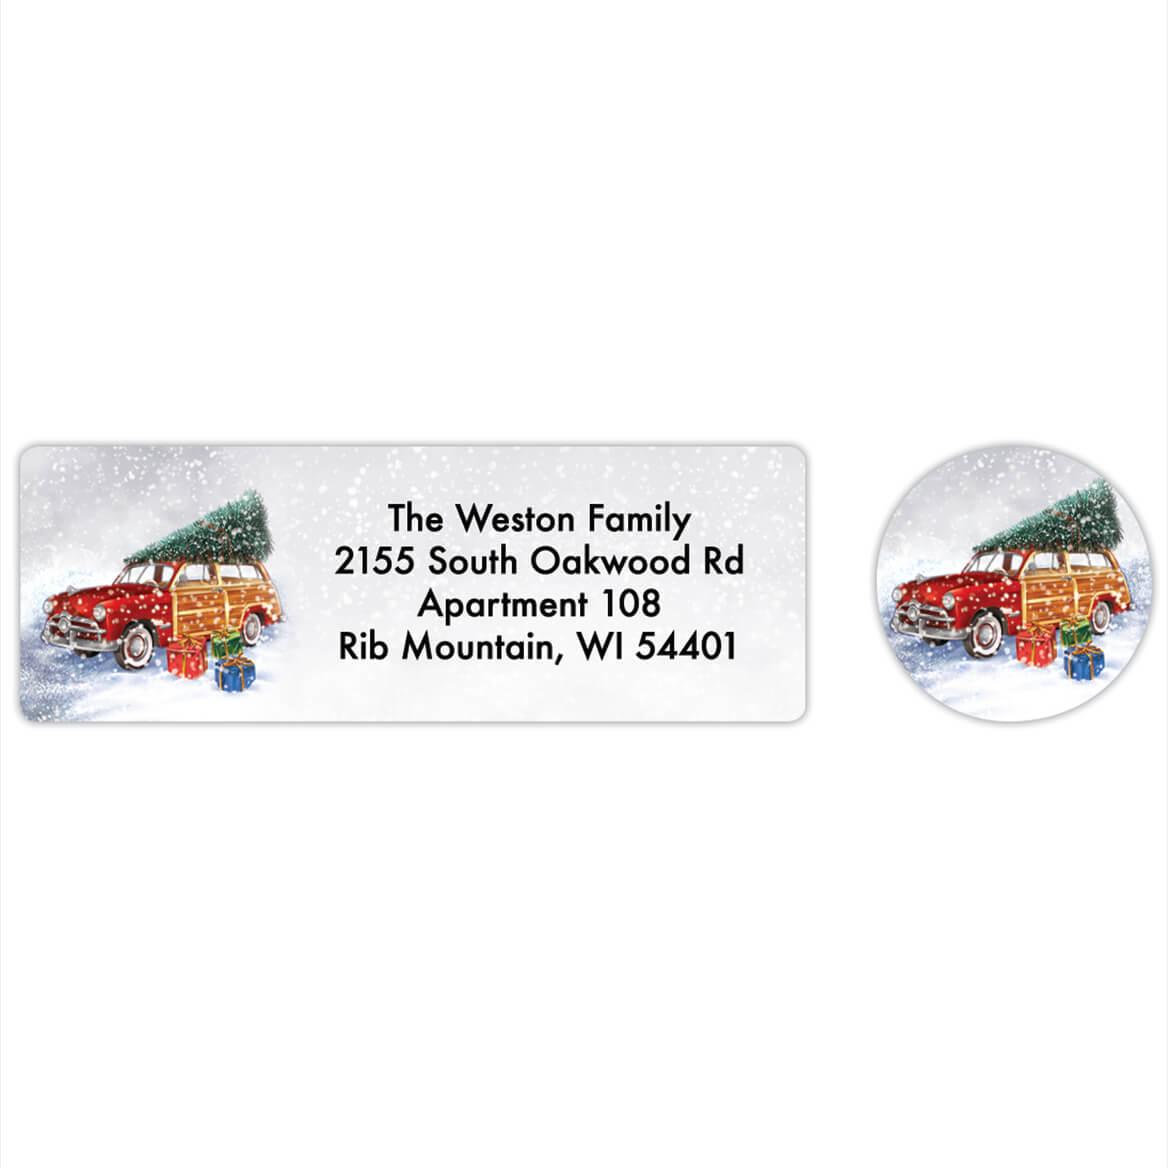 Personalized Mason Jar Labels & Seals 20-368271